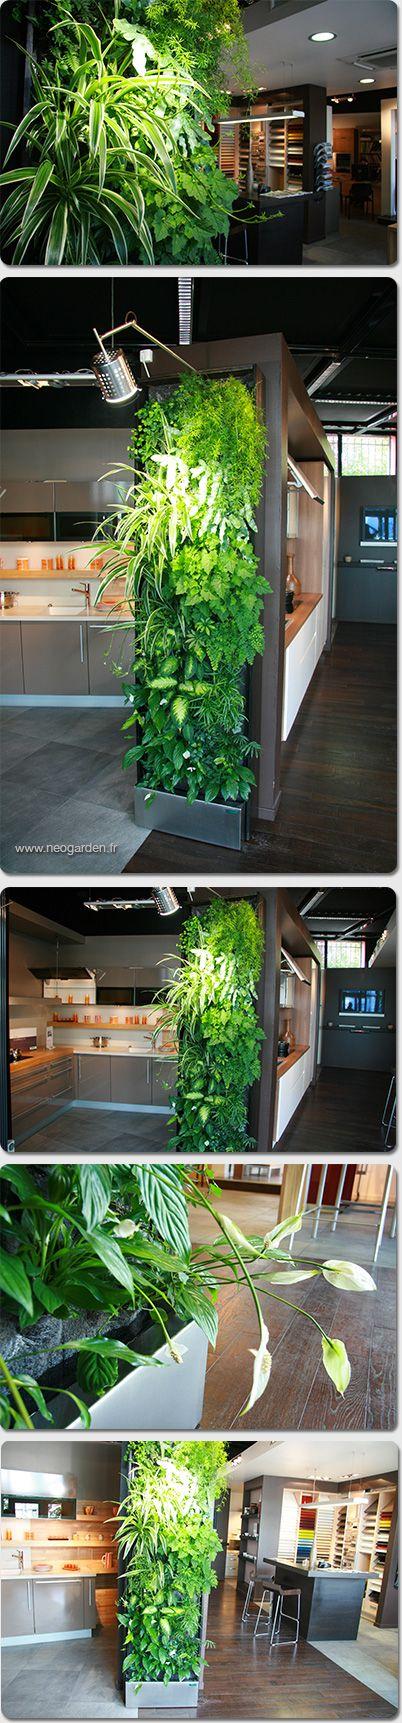 Module de mur végétal 65cm x 240cm | Green wall module 65cm x 240cm | #verticalgarden #murvegetal #designinterieur #фитомодуль